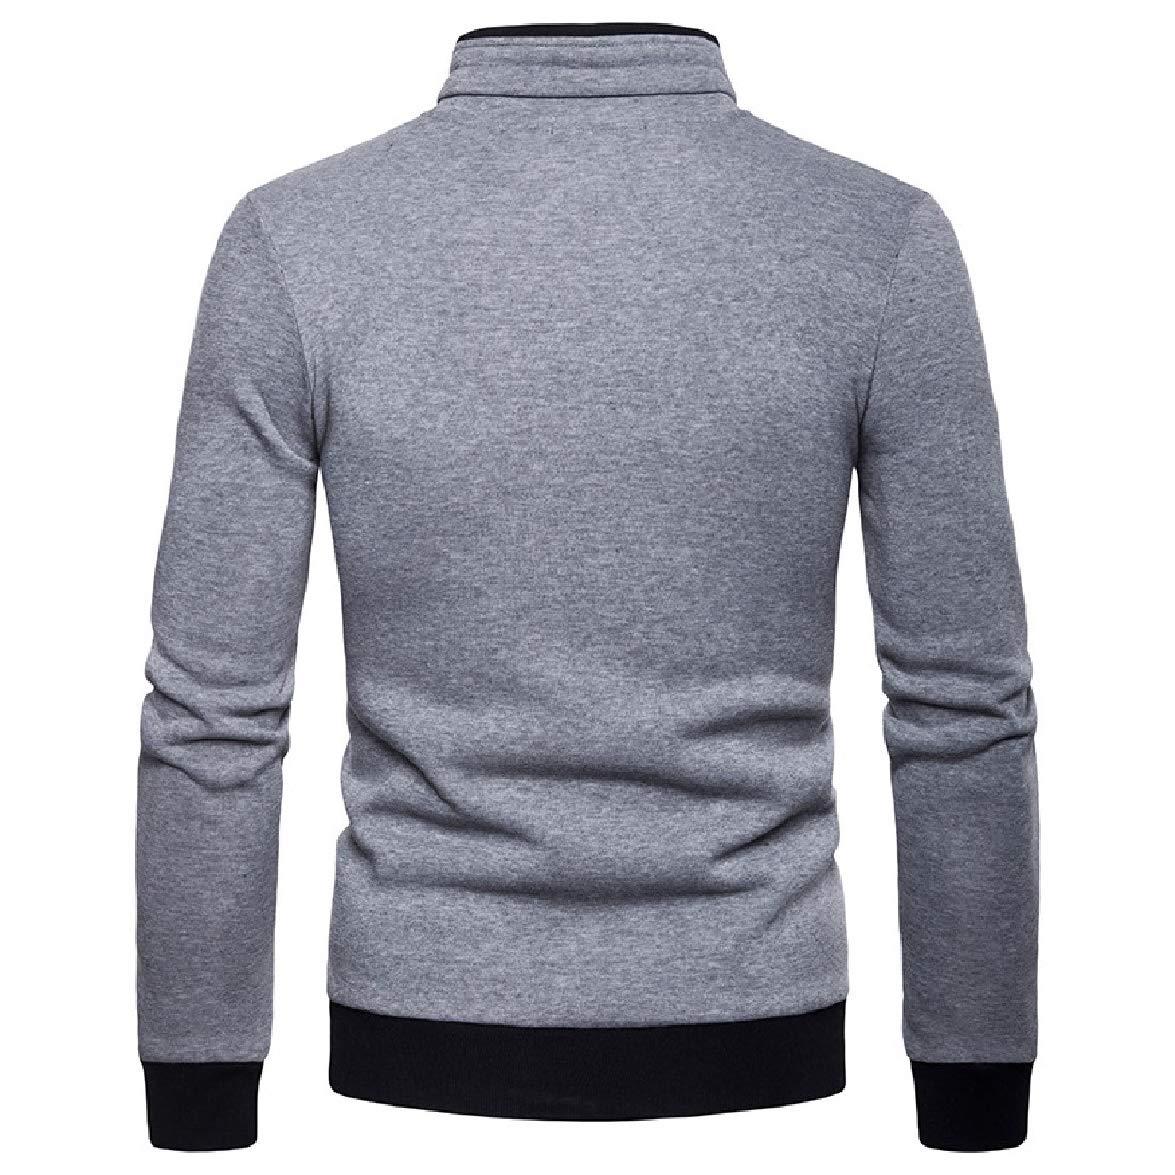 Abetteric Mens Plus Size Stand Collar Multi-Pocket Zipper Outwear Jackets Tracksuit Top